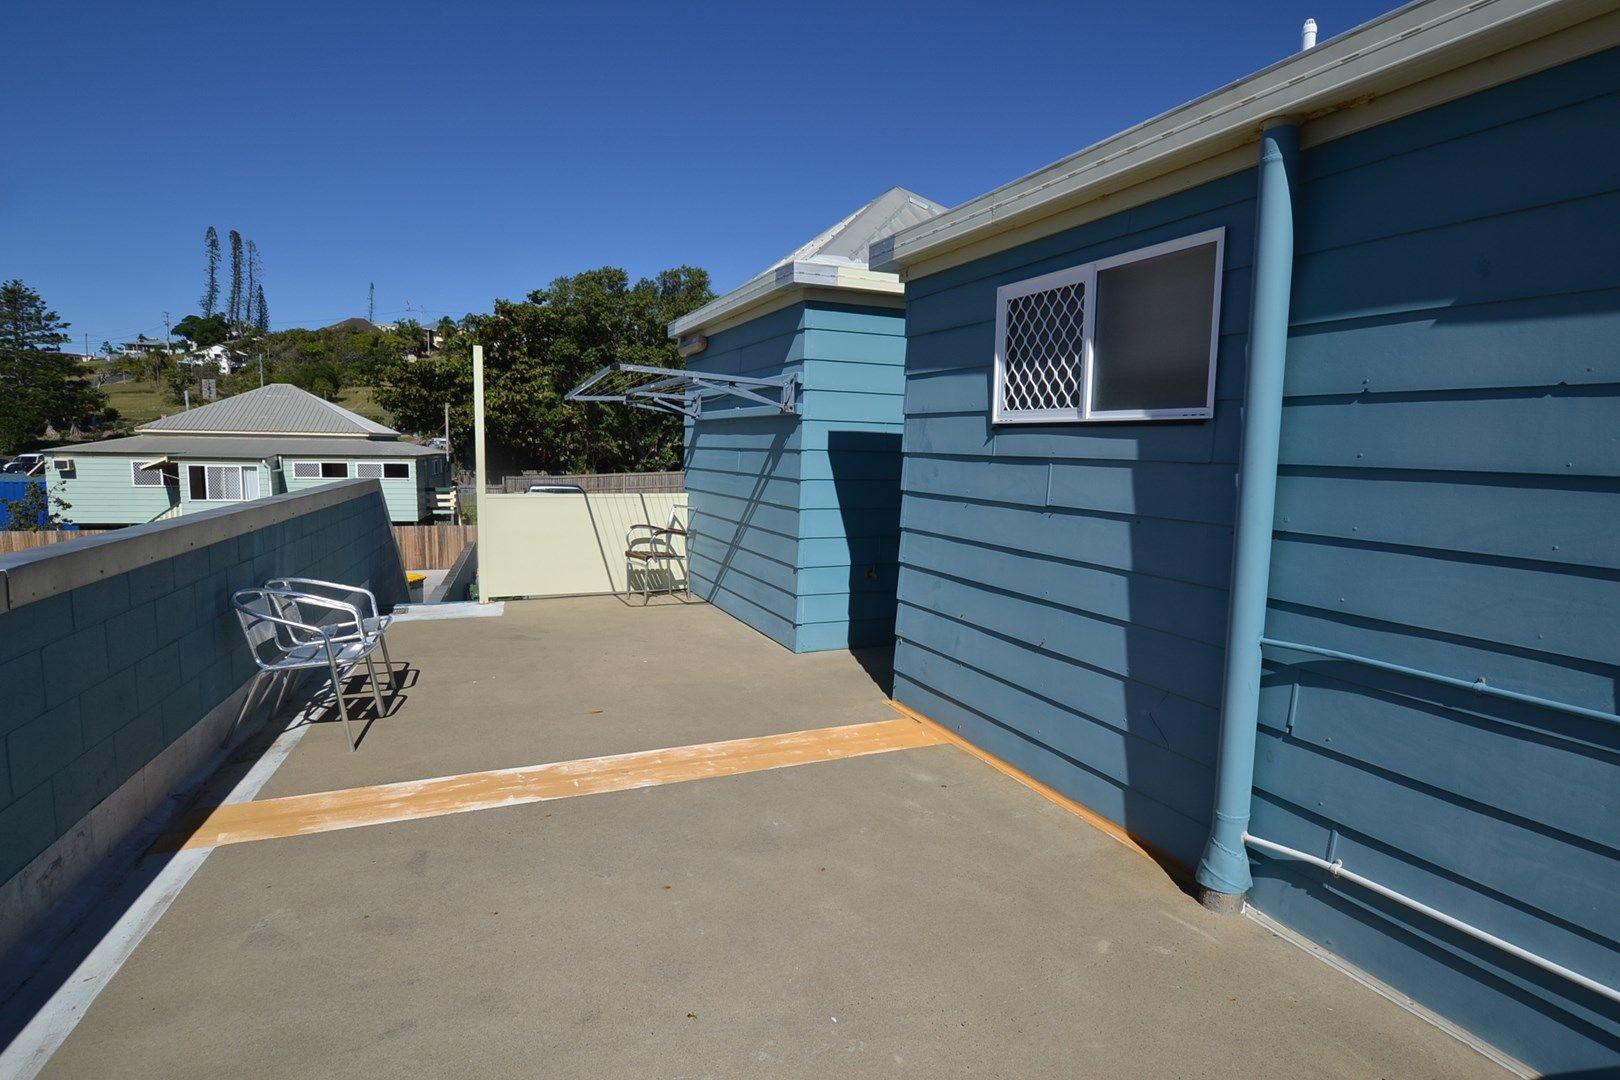 5/10 James Street, Yeppoon QLD 4703, Image 7